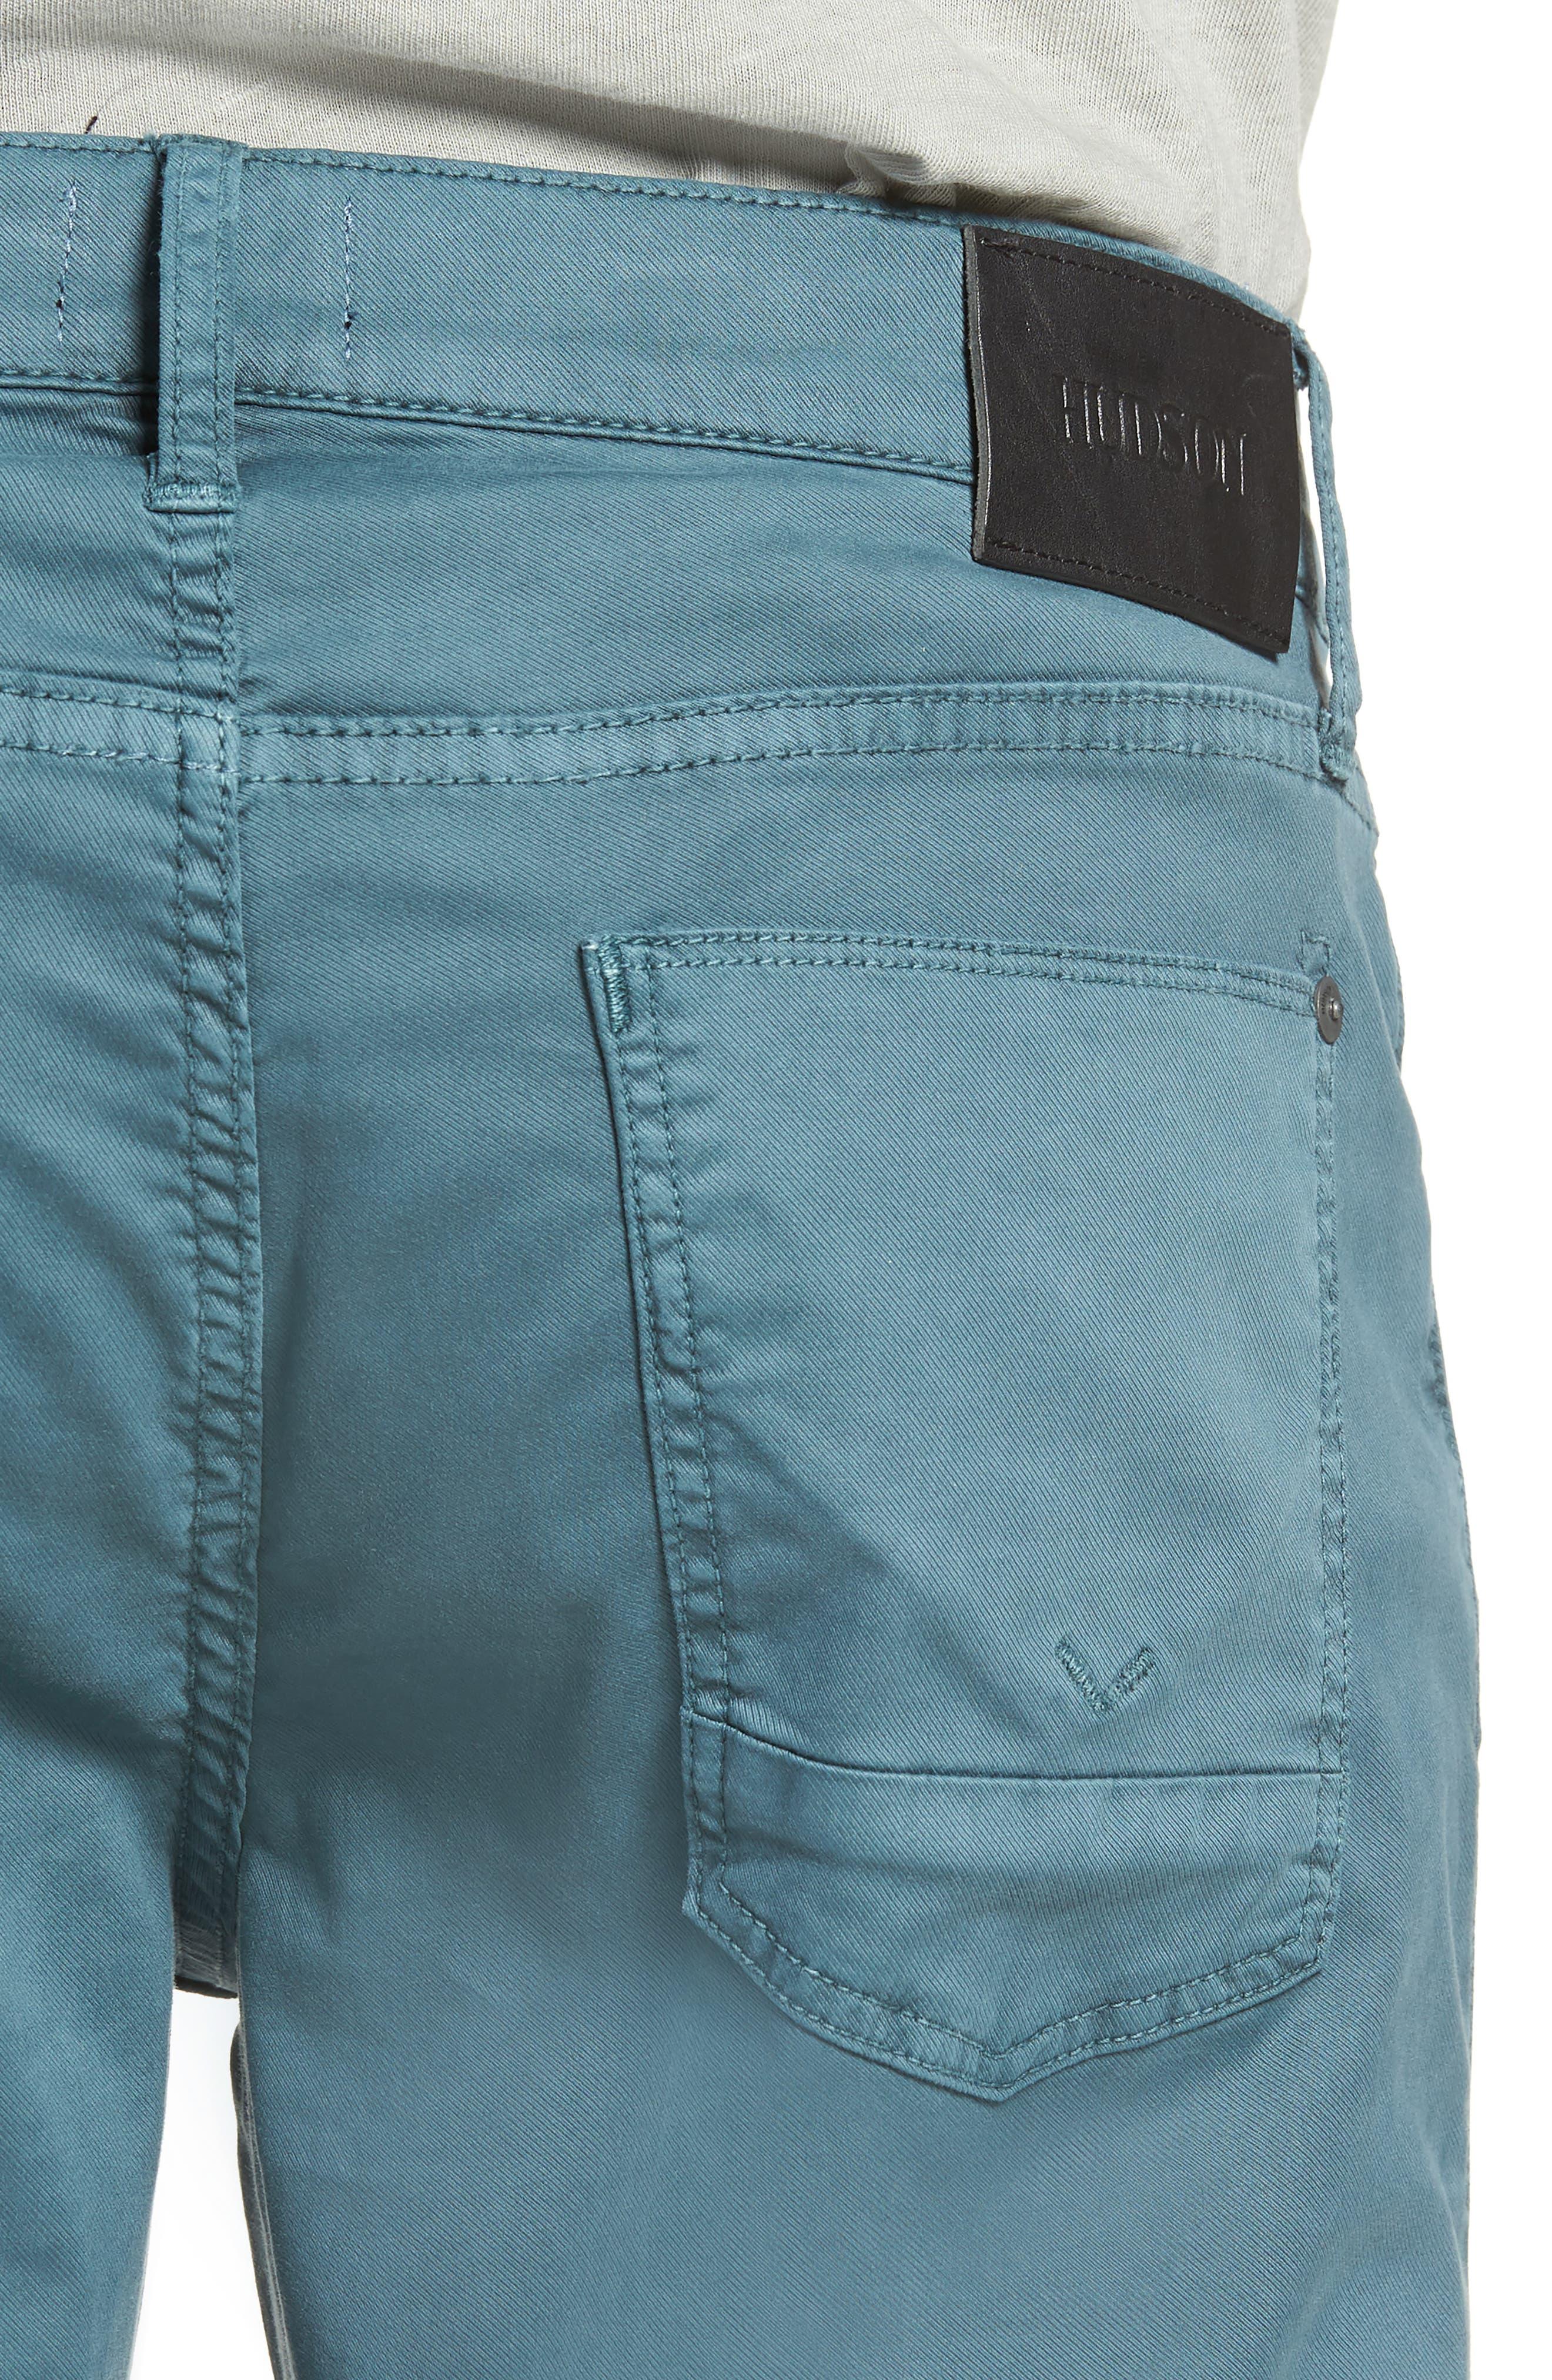 Blake Slim Fit Jeans,                             Alternate thumbnail 4, color,                             497